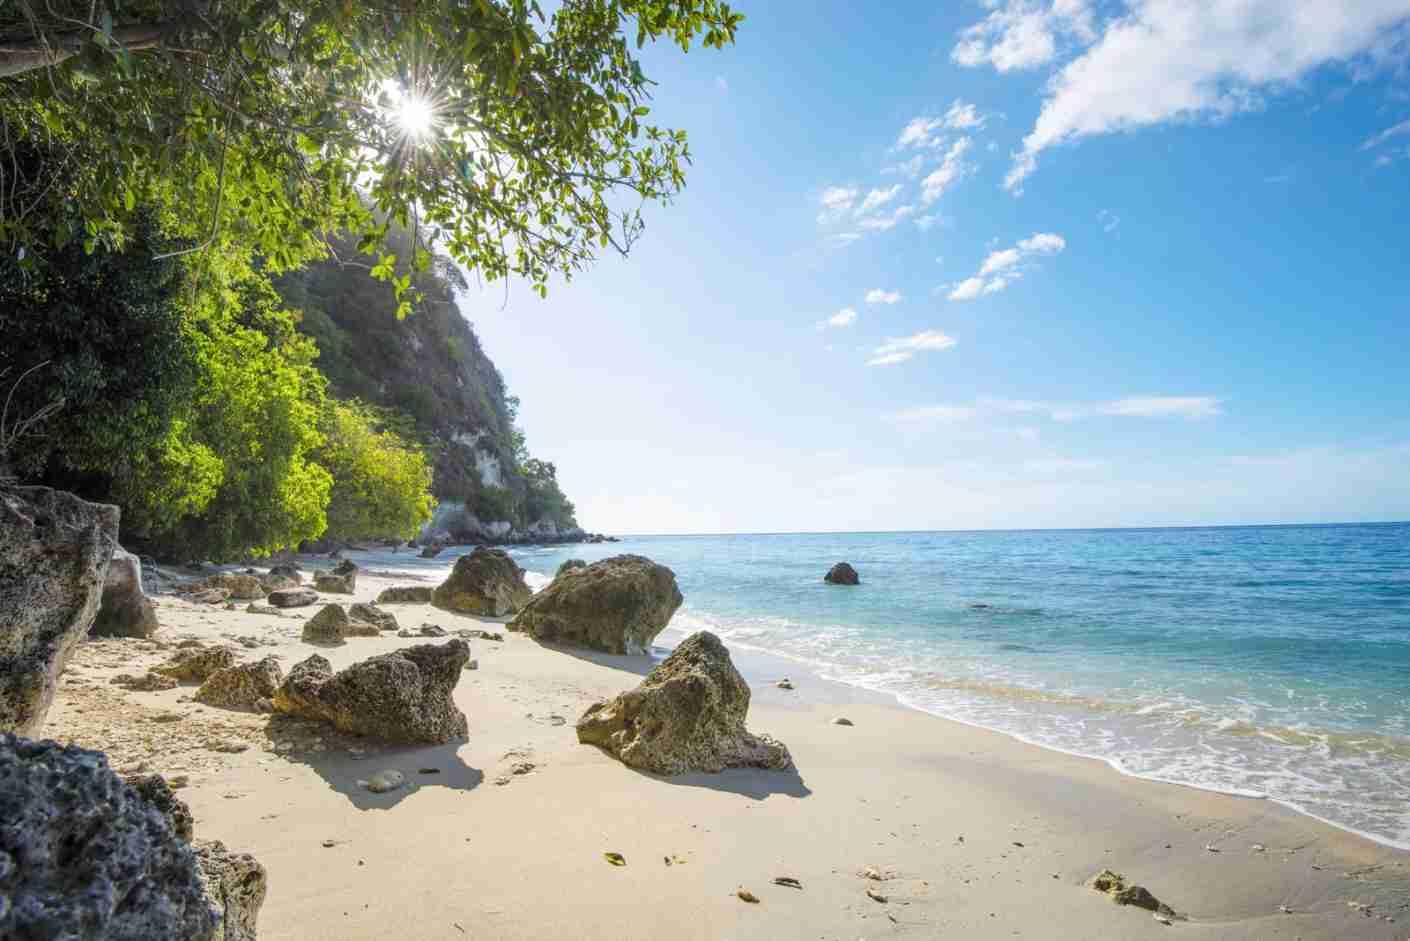 Alor Island. (Photo via Shutterstock)